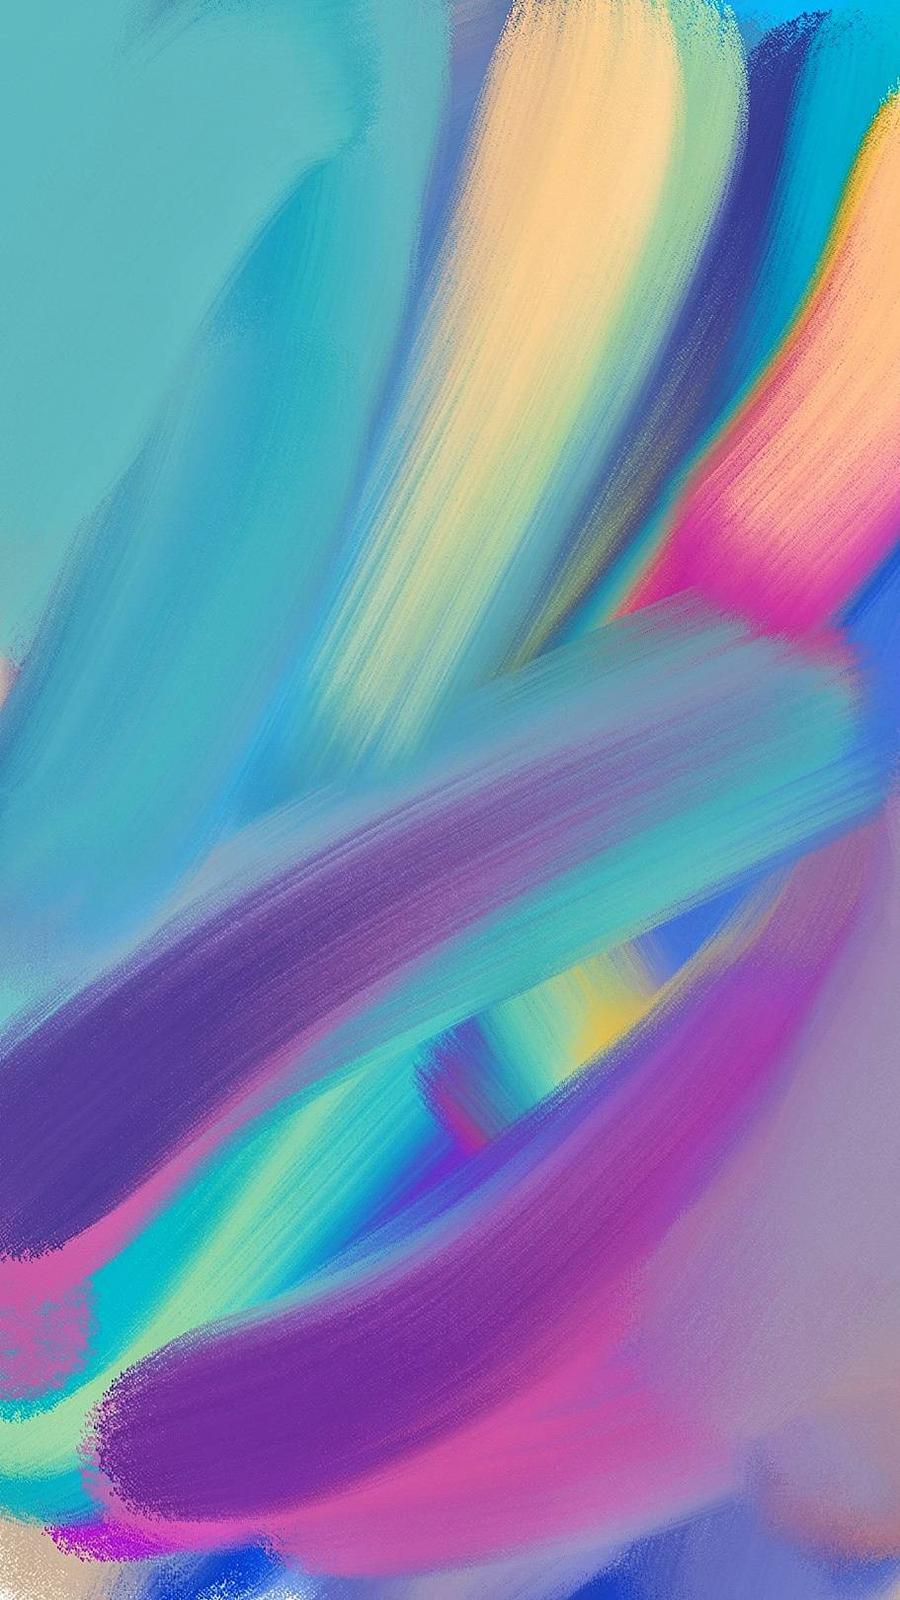 OnePlus 6 Stock Wallpapers – OnePlus Wallpaper Free Download